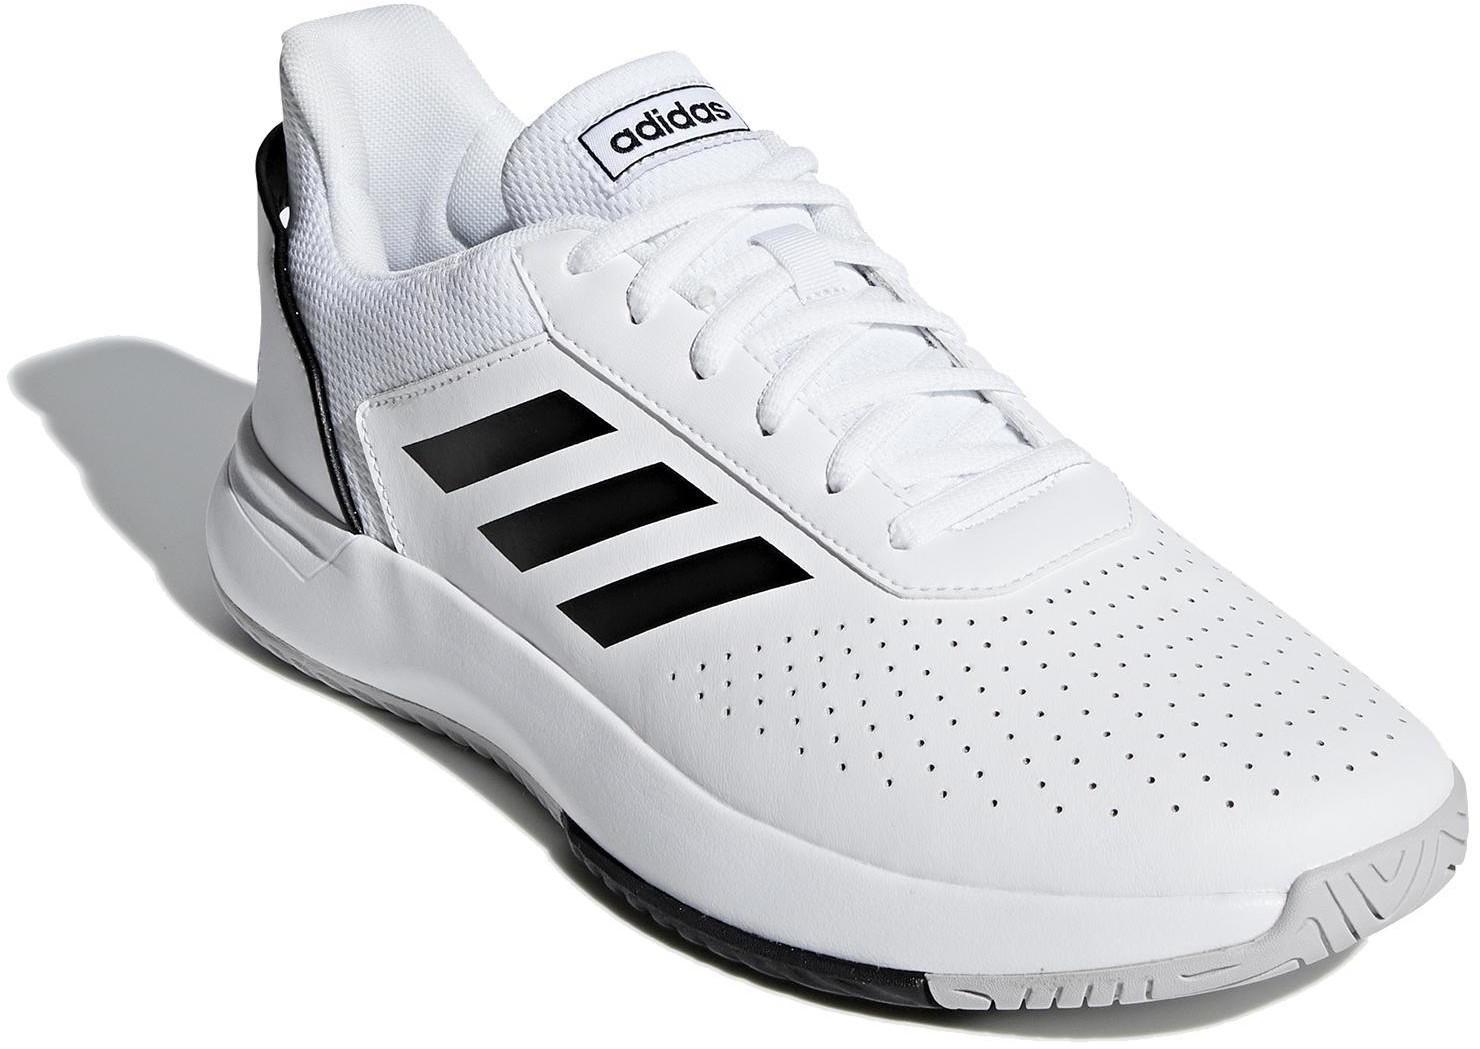 Adidas Buty Tenis Courtsmash Męskie male